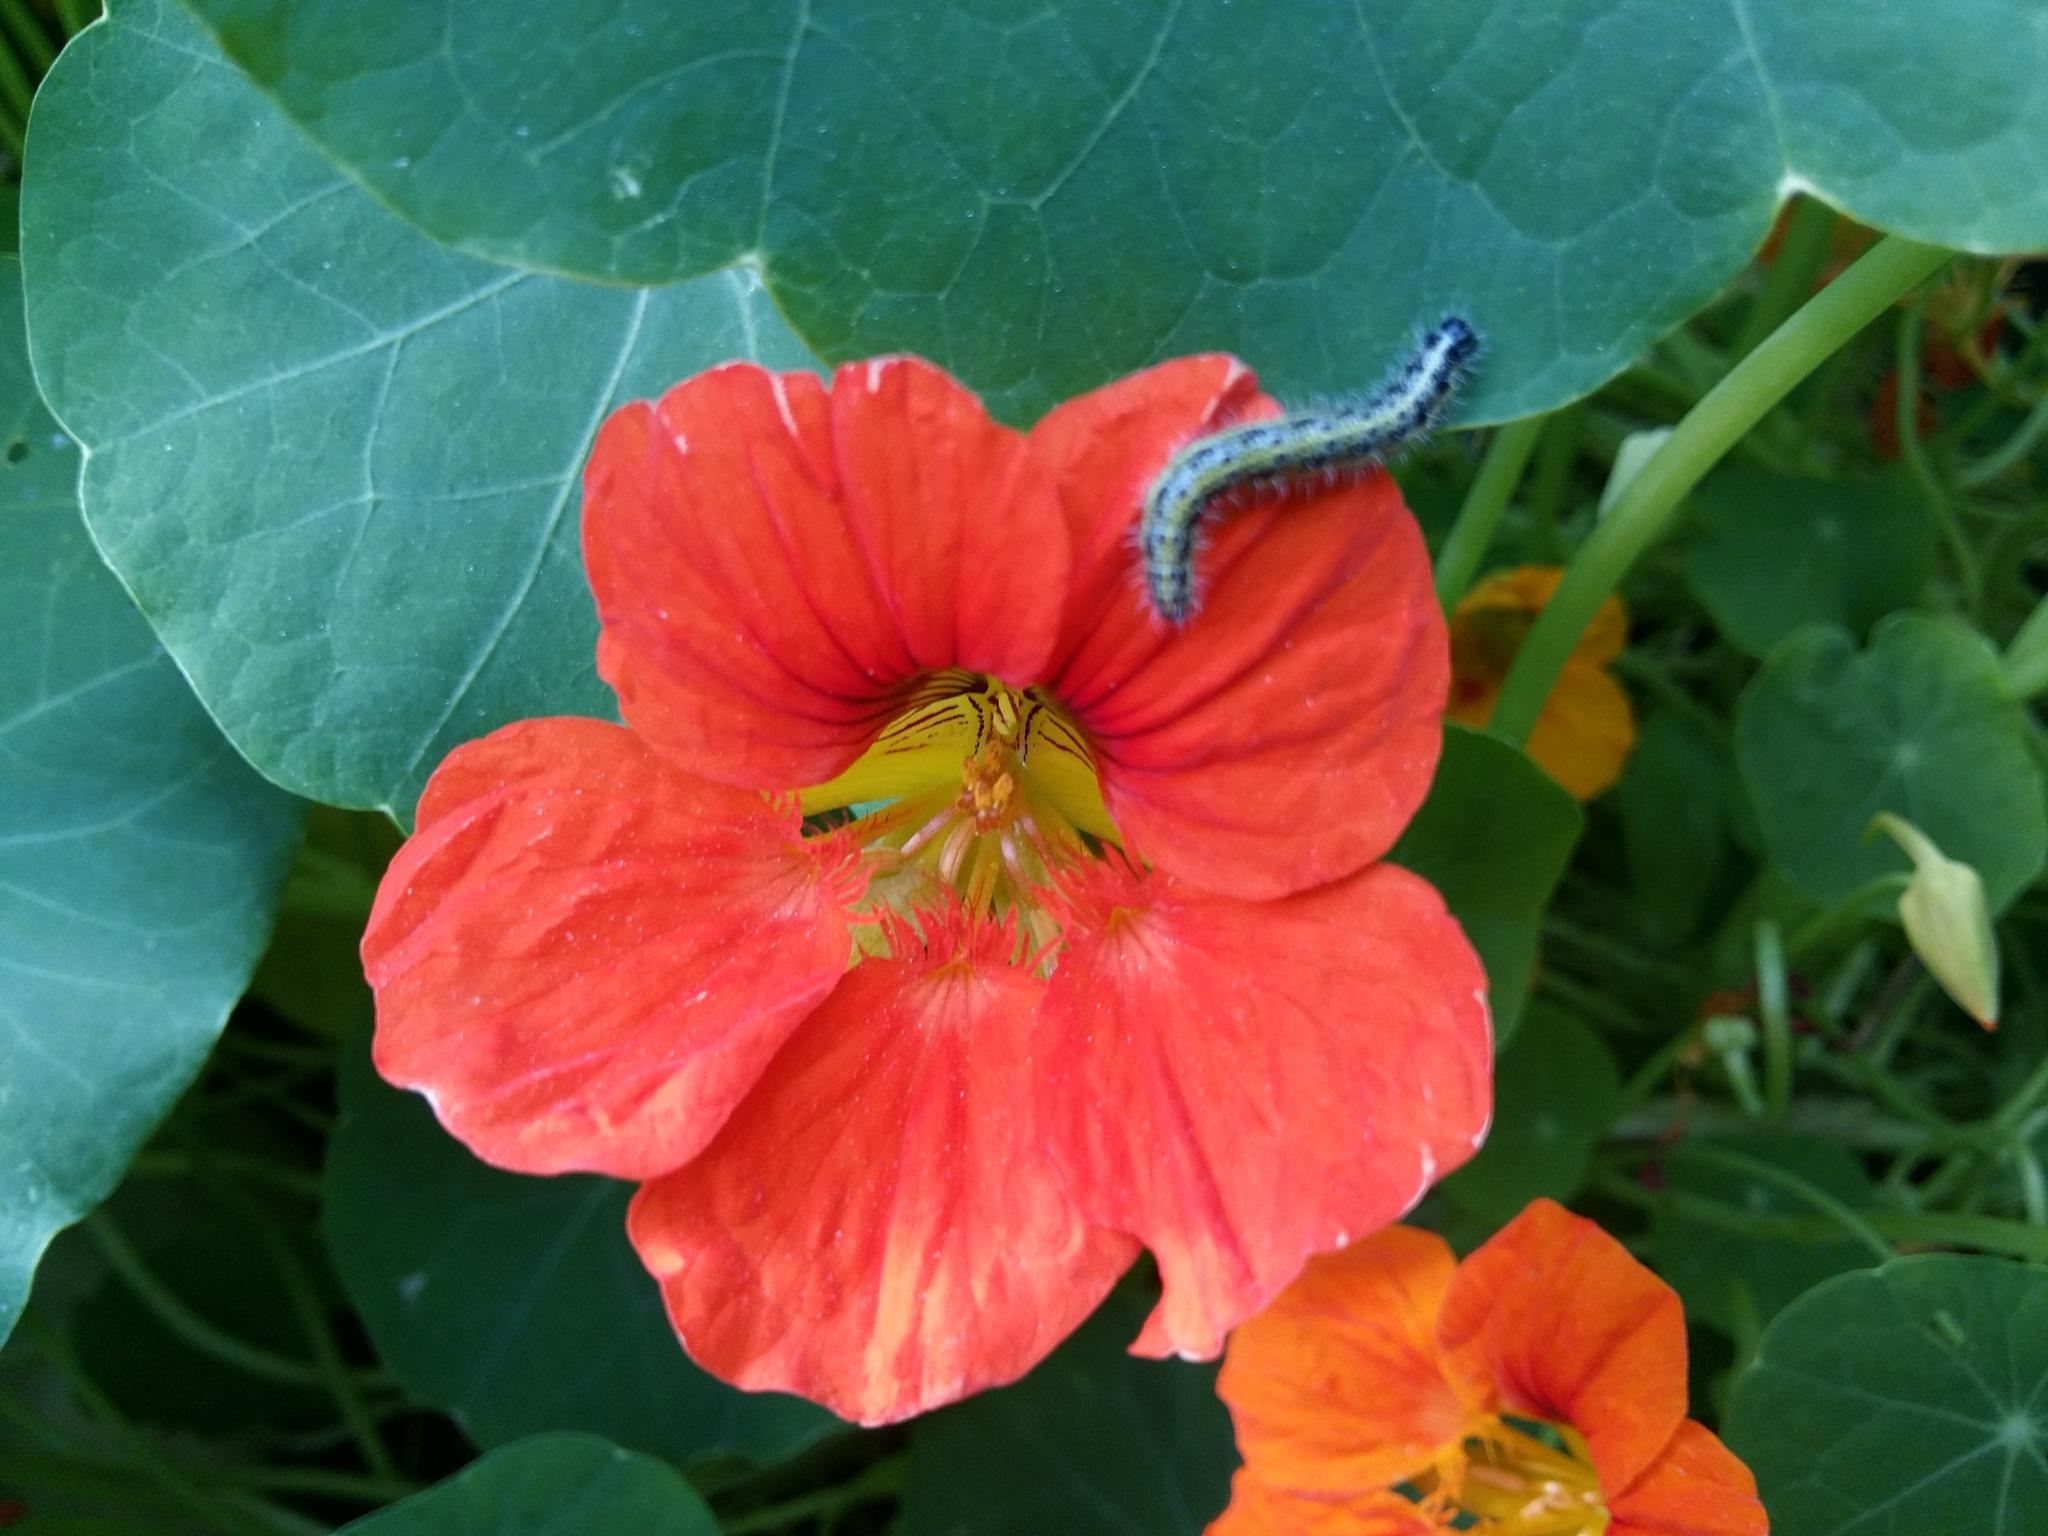 Flower and caterpillar by uzkuraitiene62